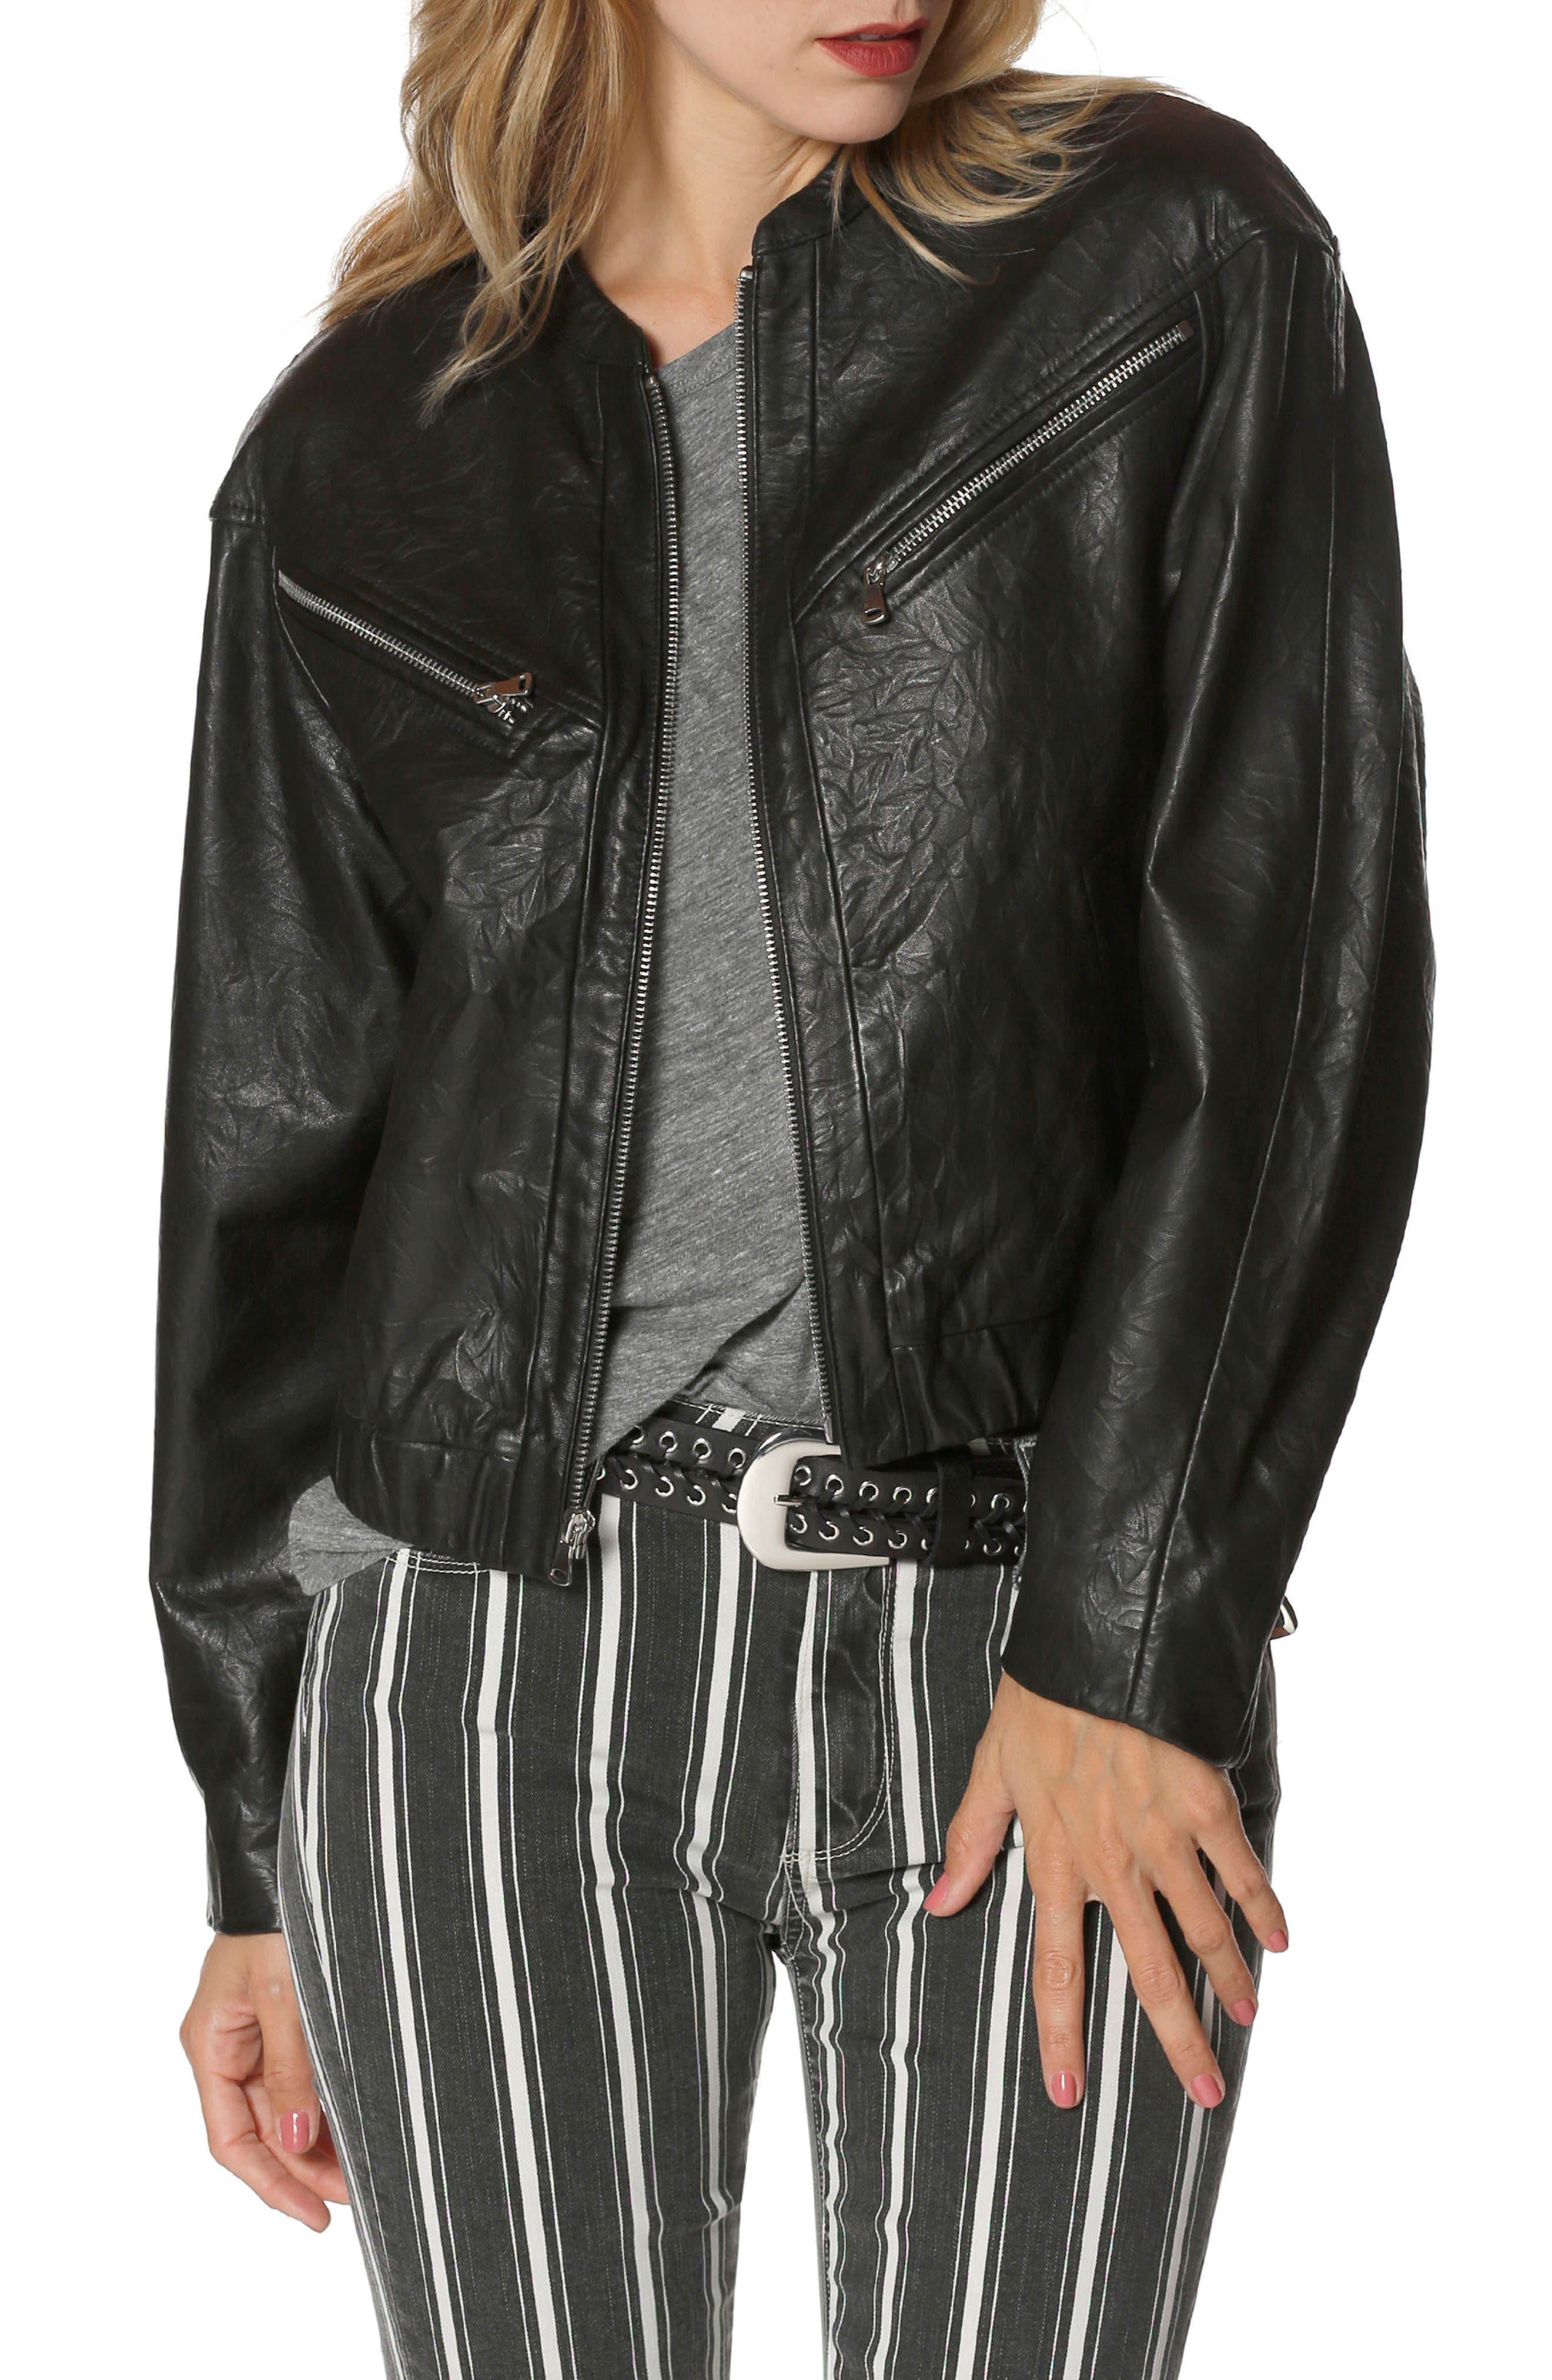 Giana Leather Moto Jacket,                         Main,                         color, Black